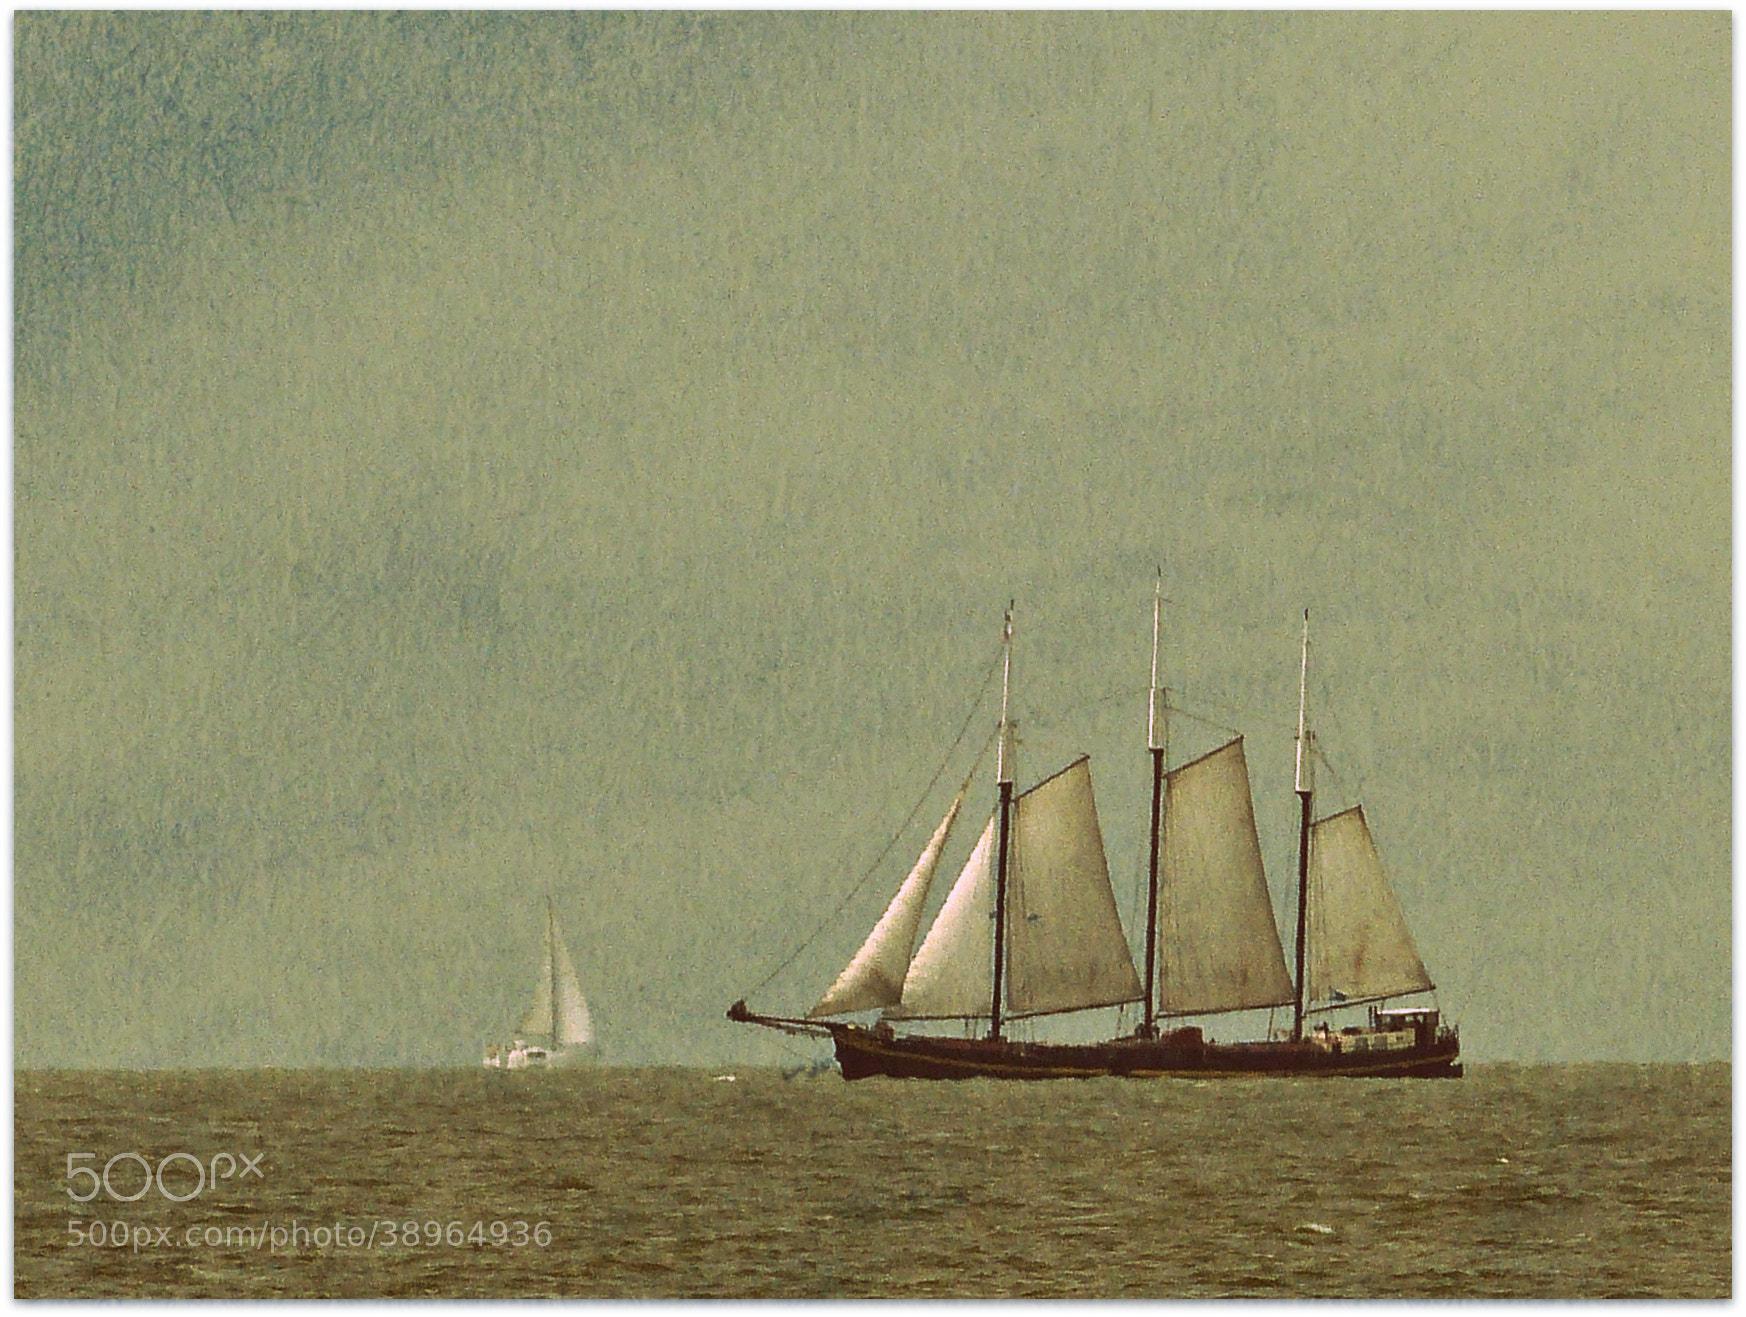 Photograph *Sailing* by Sandra Boolman on 500px